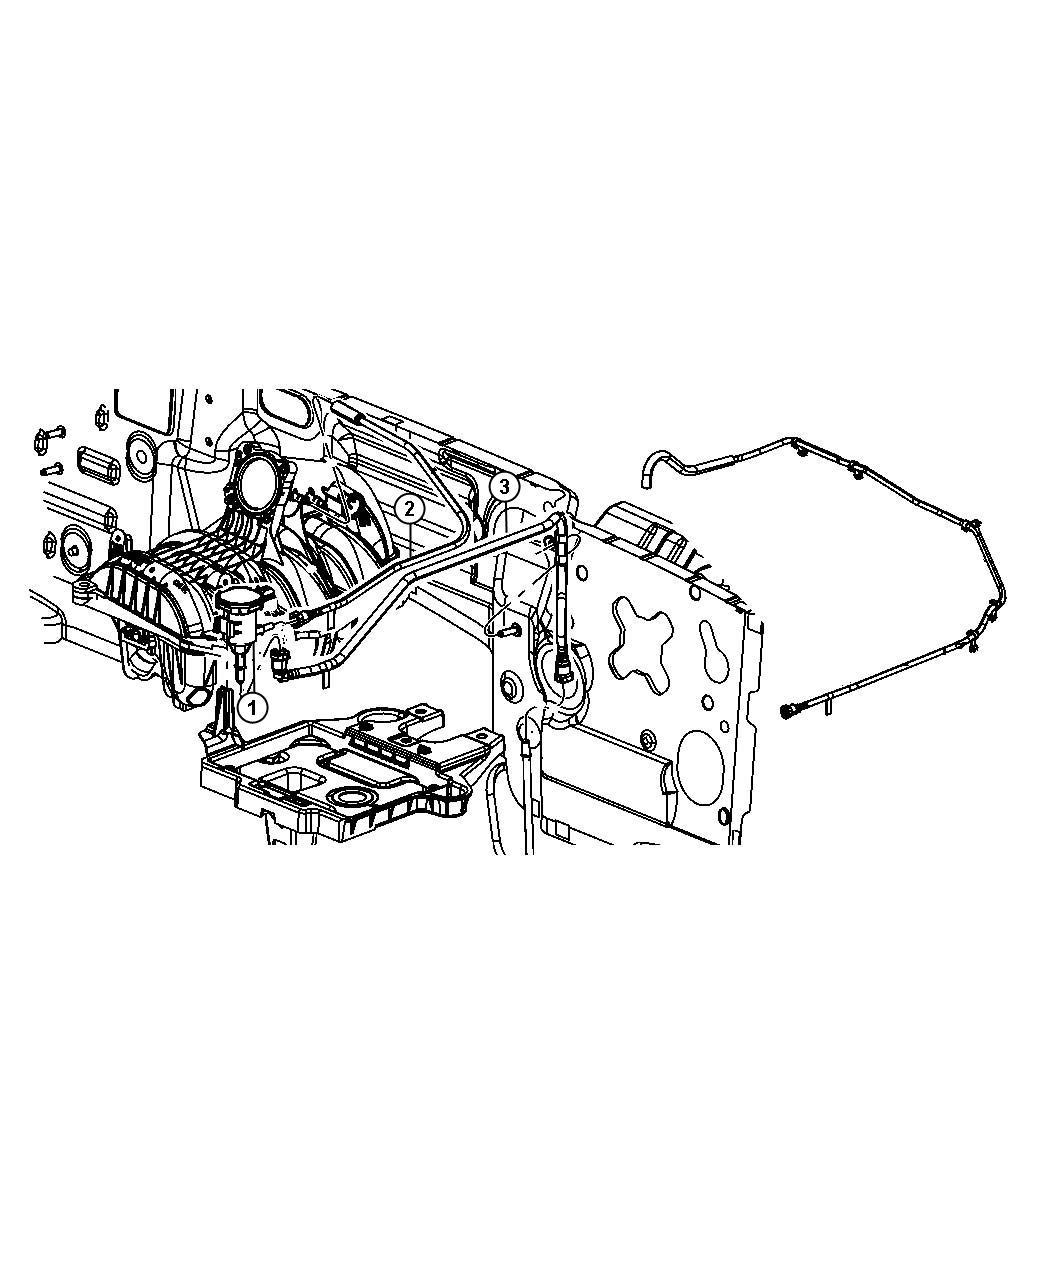 2010 Jeep Liberty Tube. Fuel vapor, throttle body purge